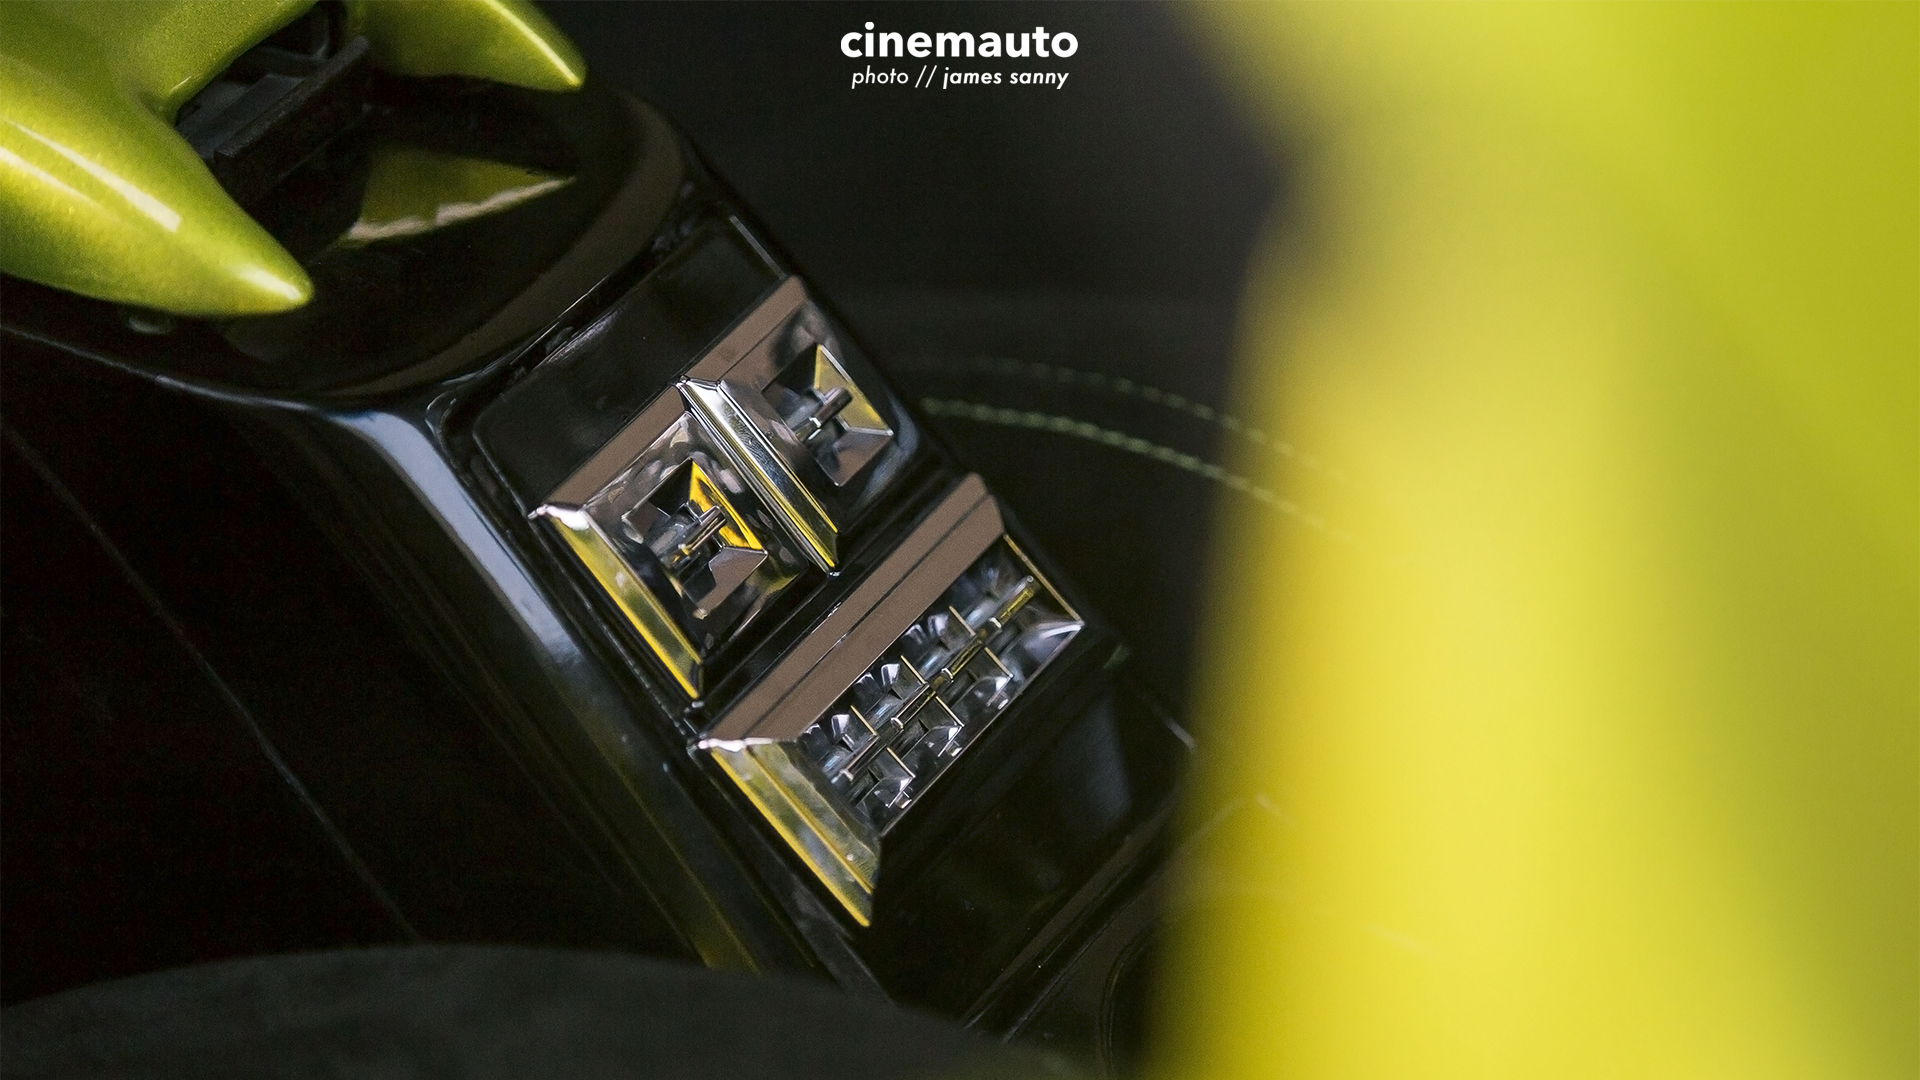 cinemauto-wichita-automotive-photographer-james-sanny-Lsm.jpg